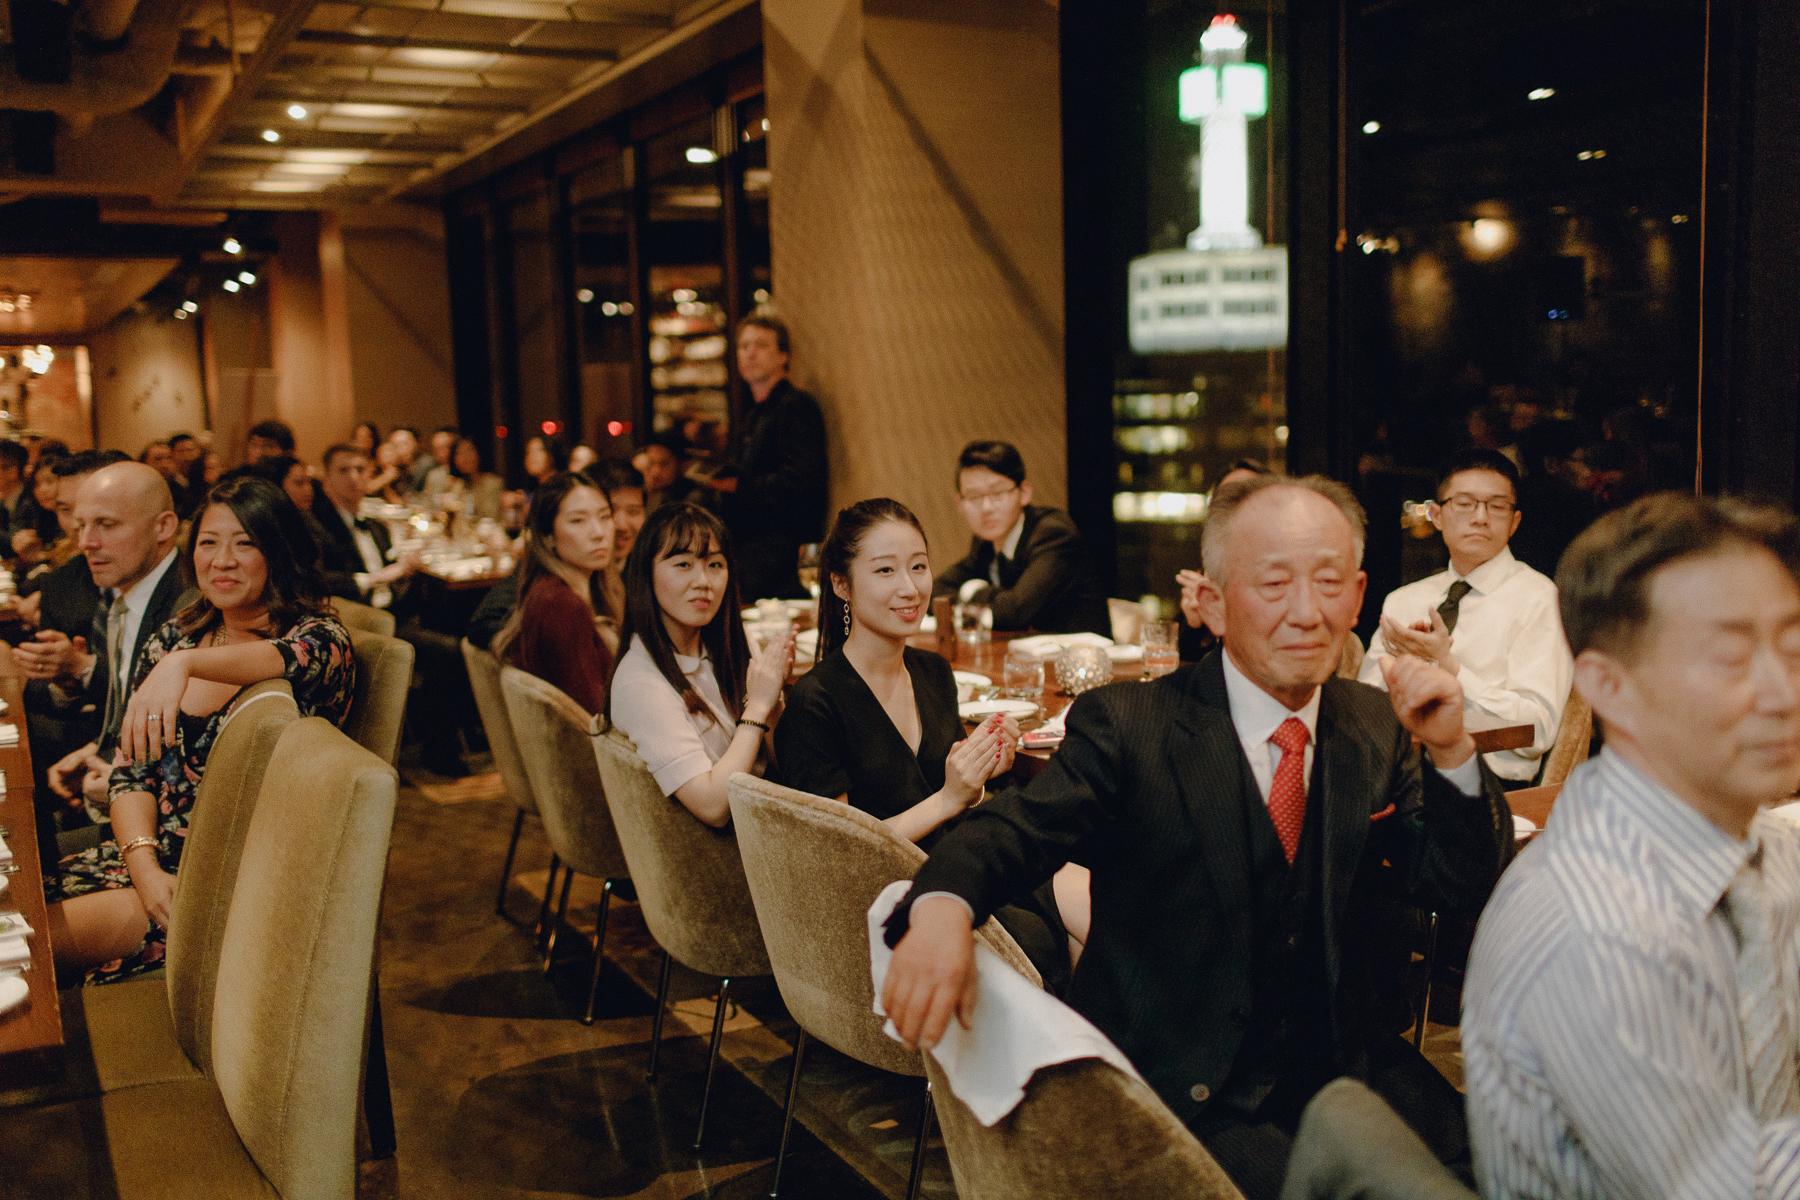 cannoe-restaurannt-wedding 0083.jpg